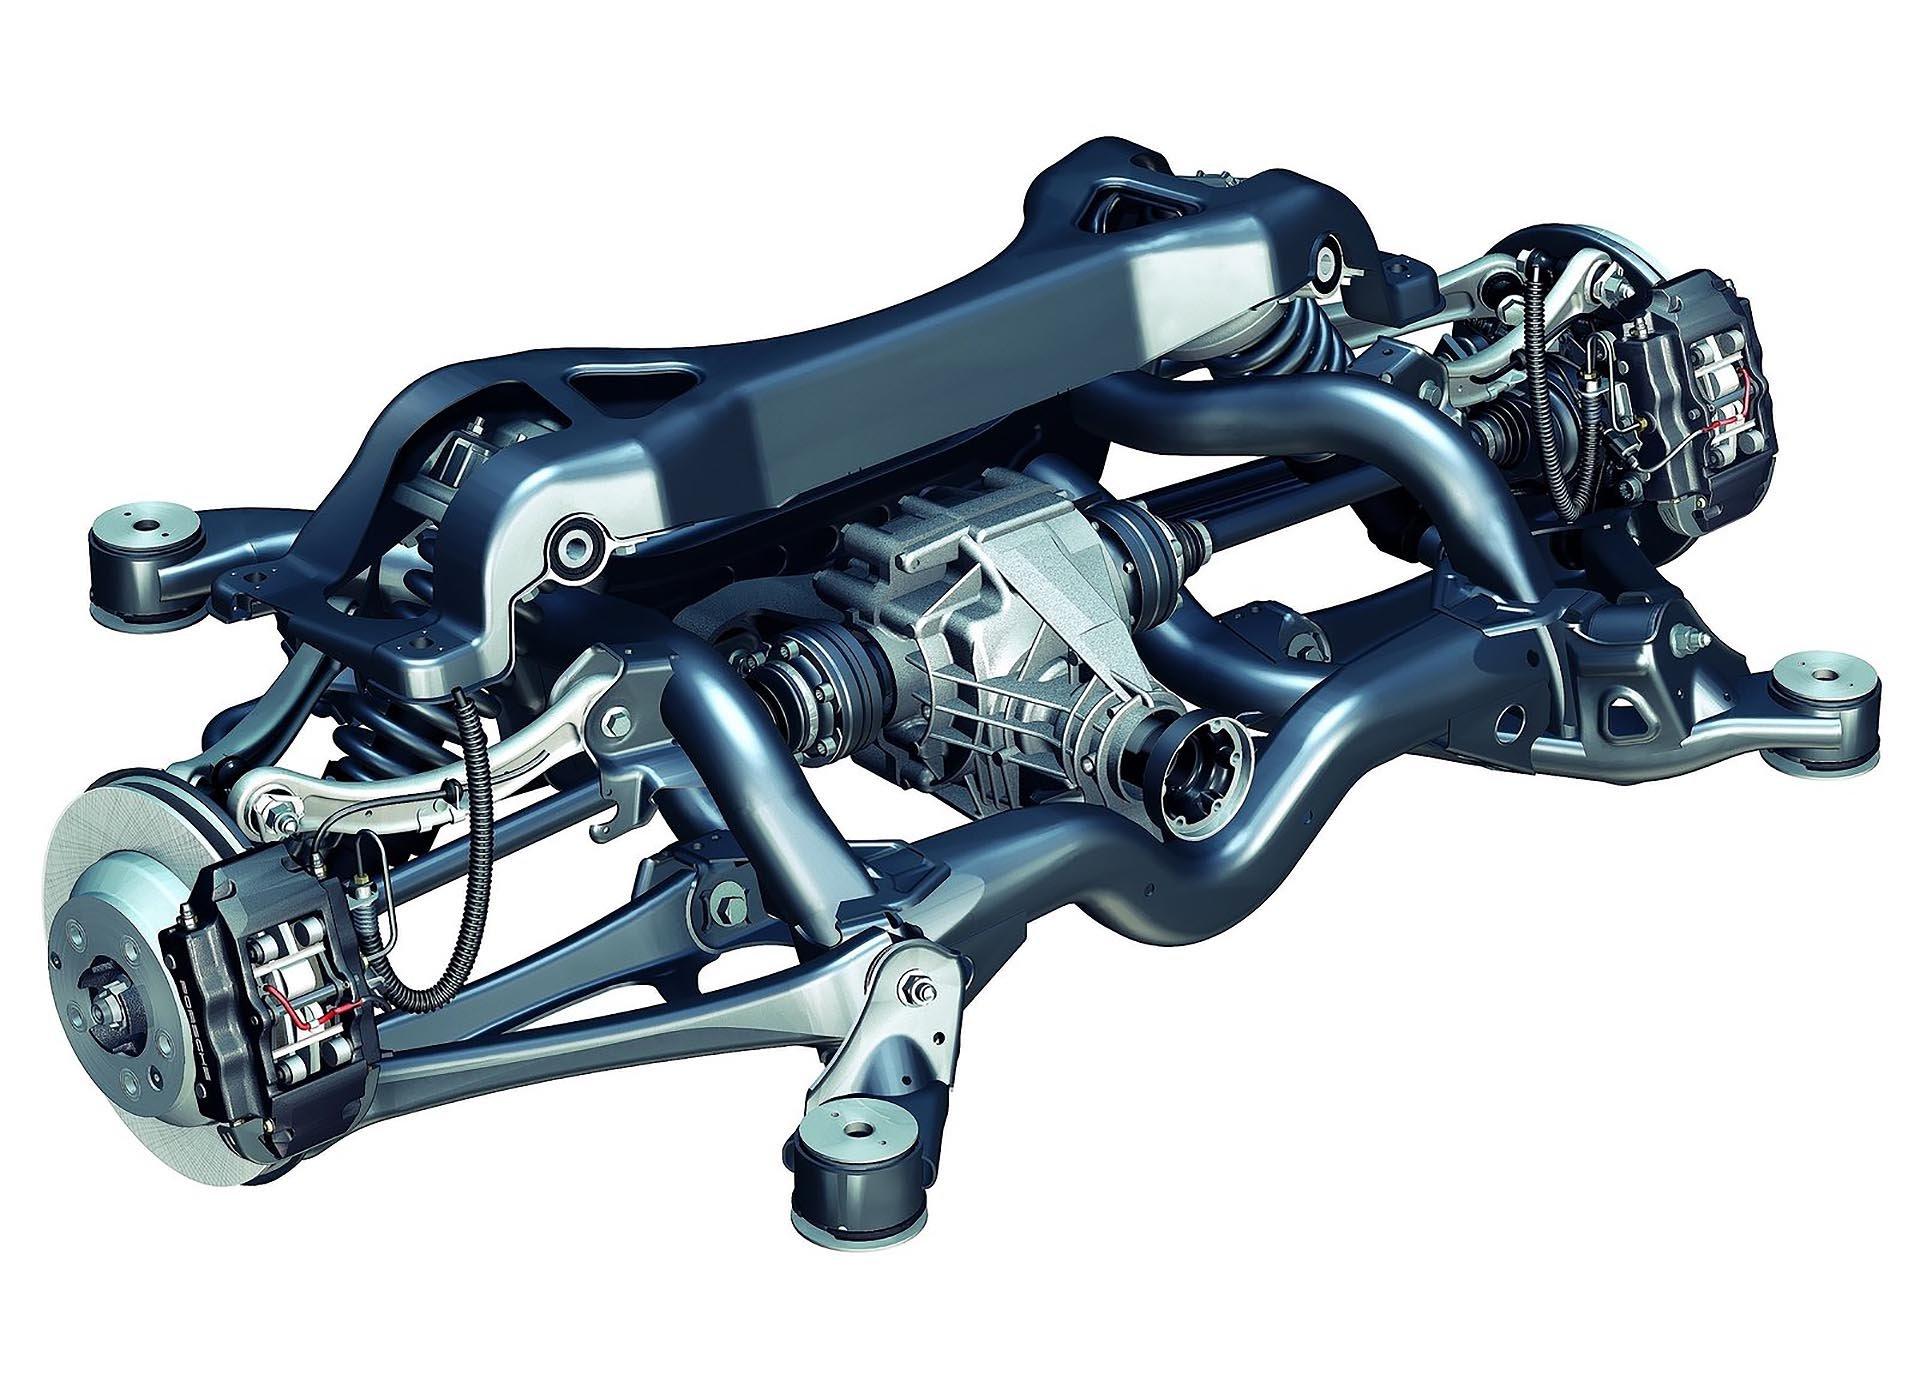 03_9PA Porsche 955 957 Cayenne rear subframe and axle diagram